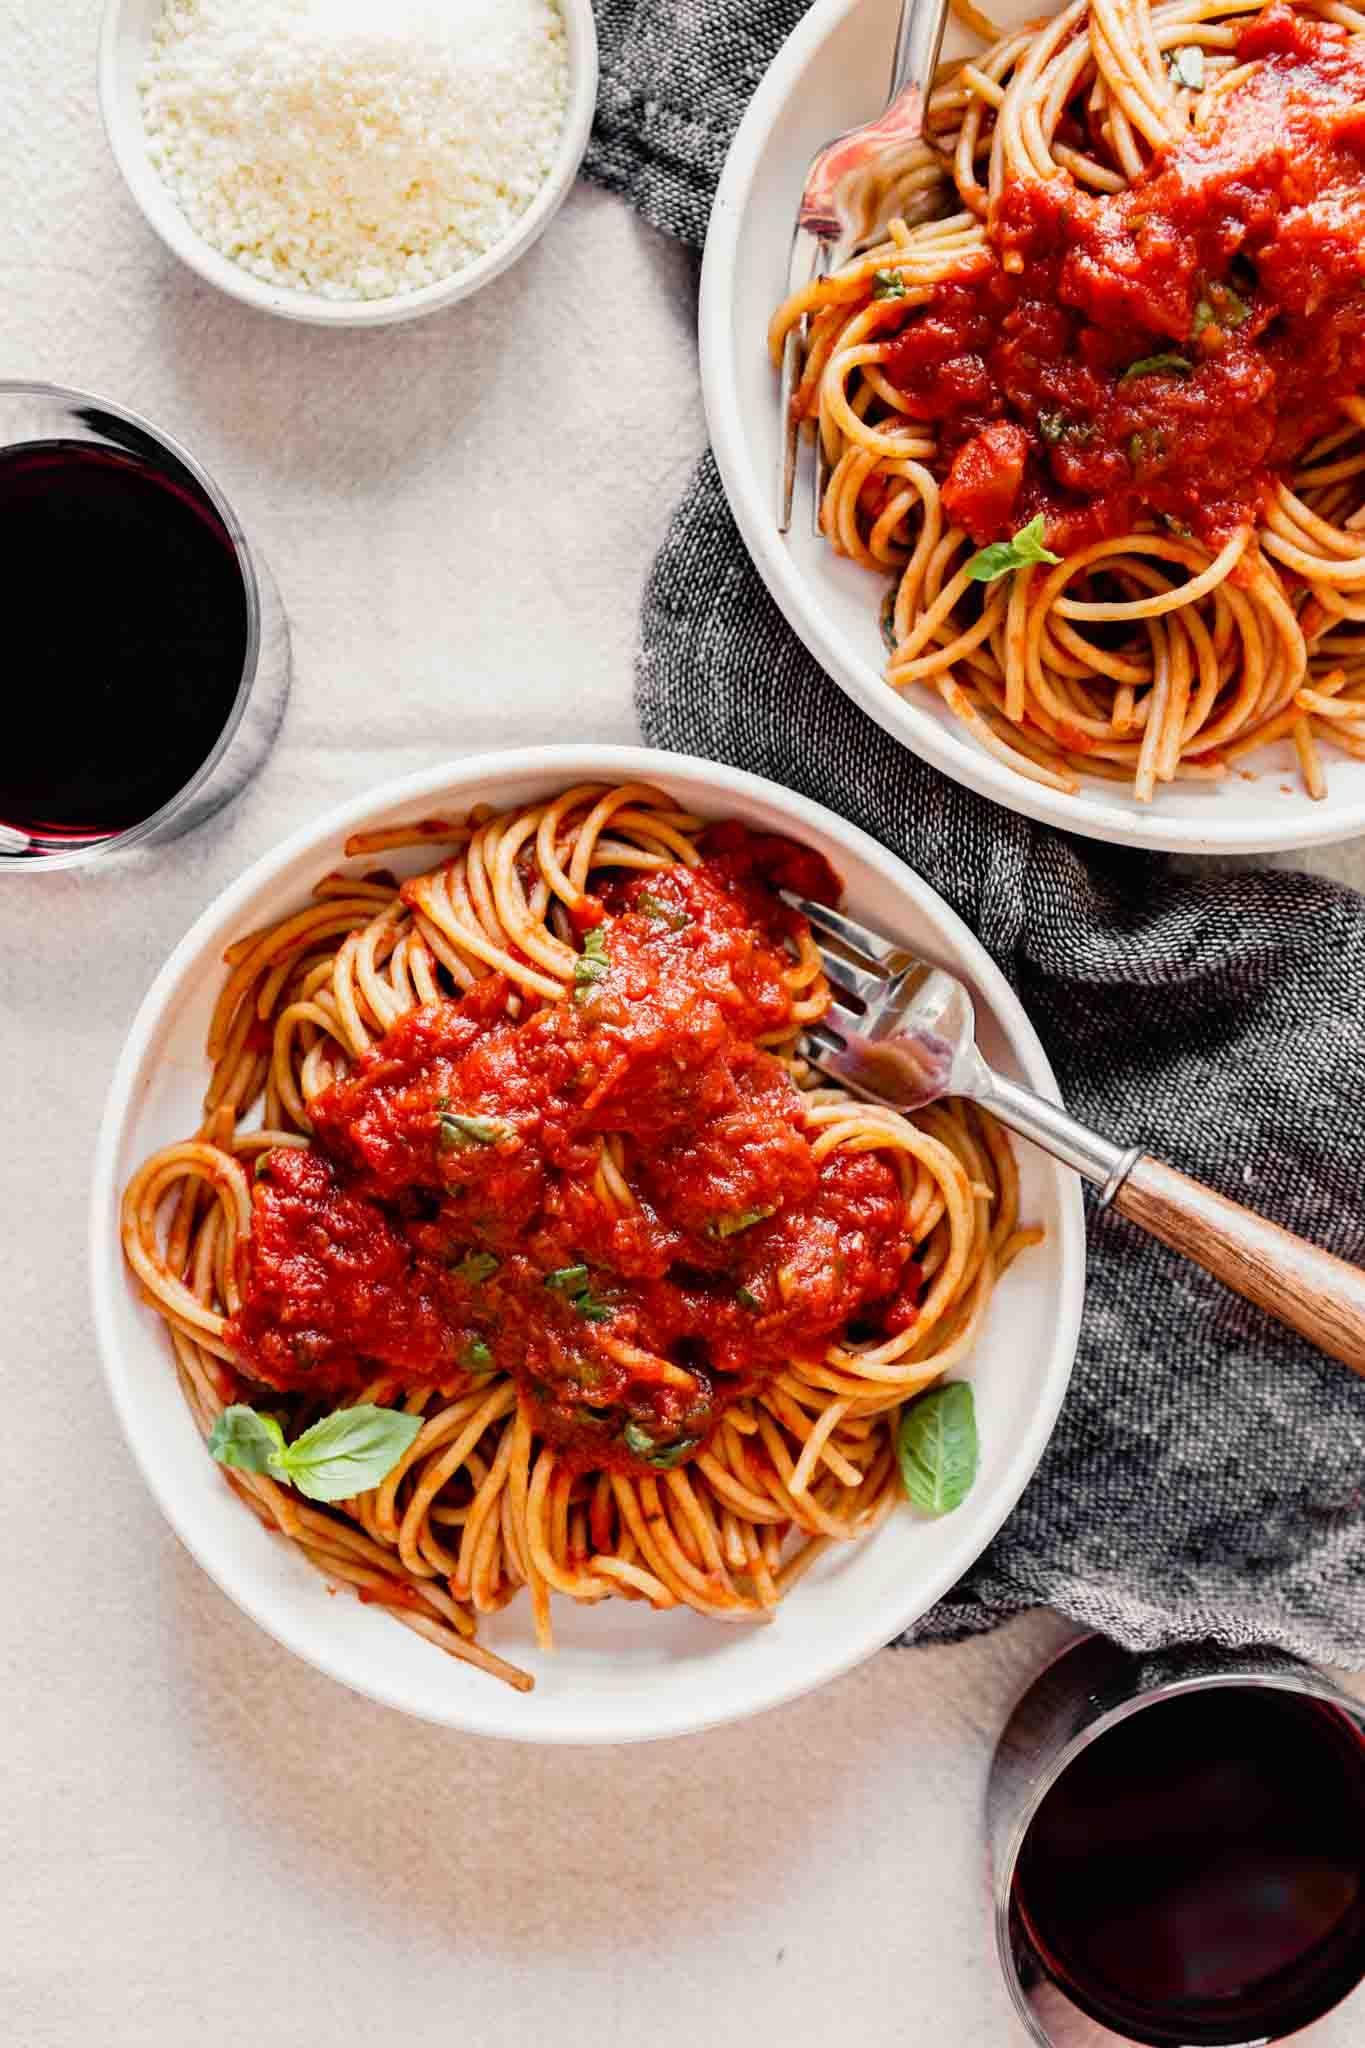 Red Wine Pasta Sauce Recipe In 2020 Red Wine Pasta Sauce Wine Pasta Sauce Pasta Sauce